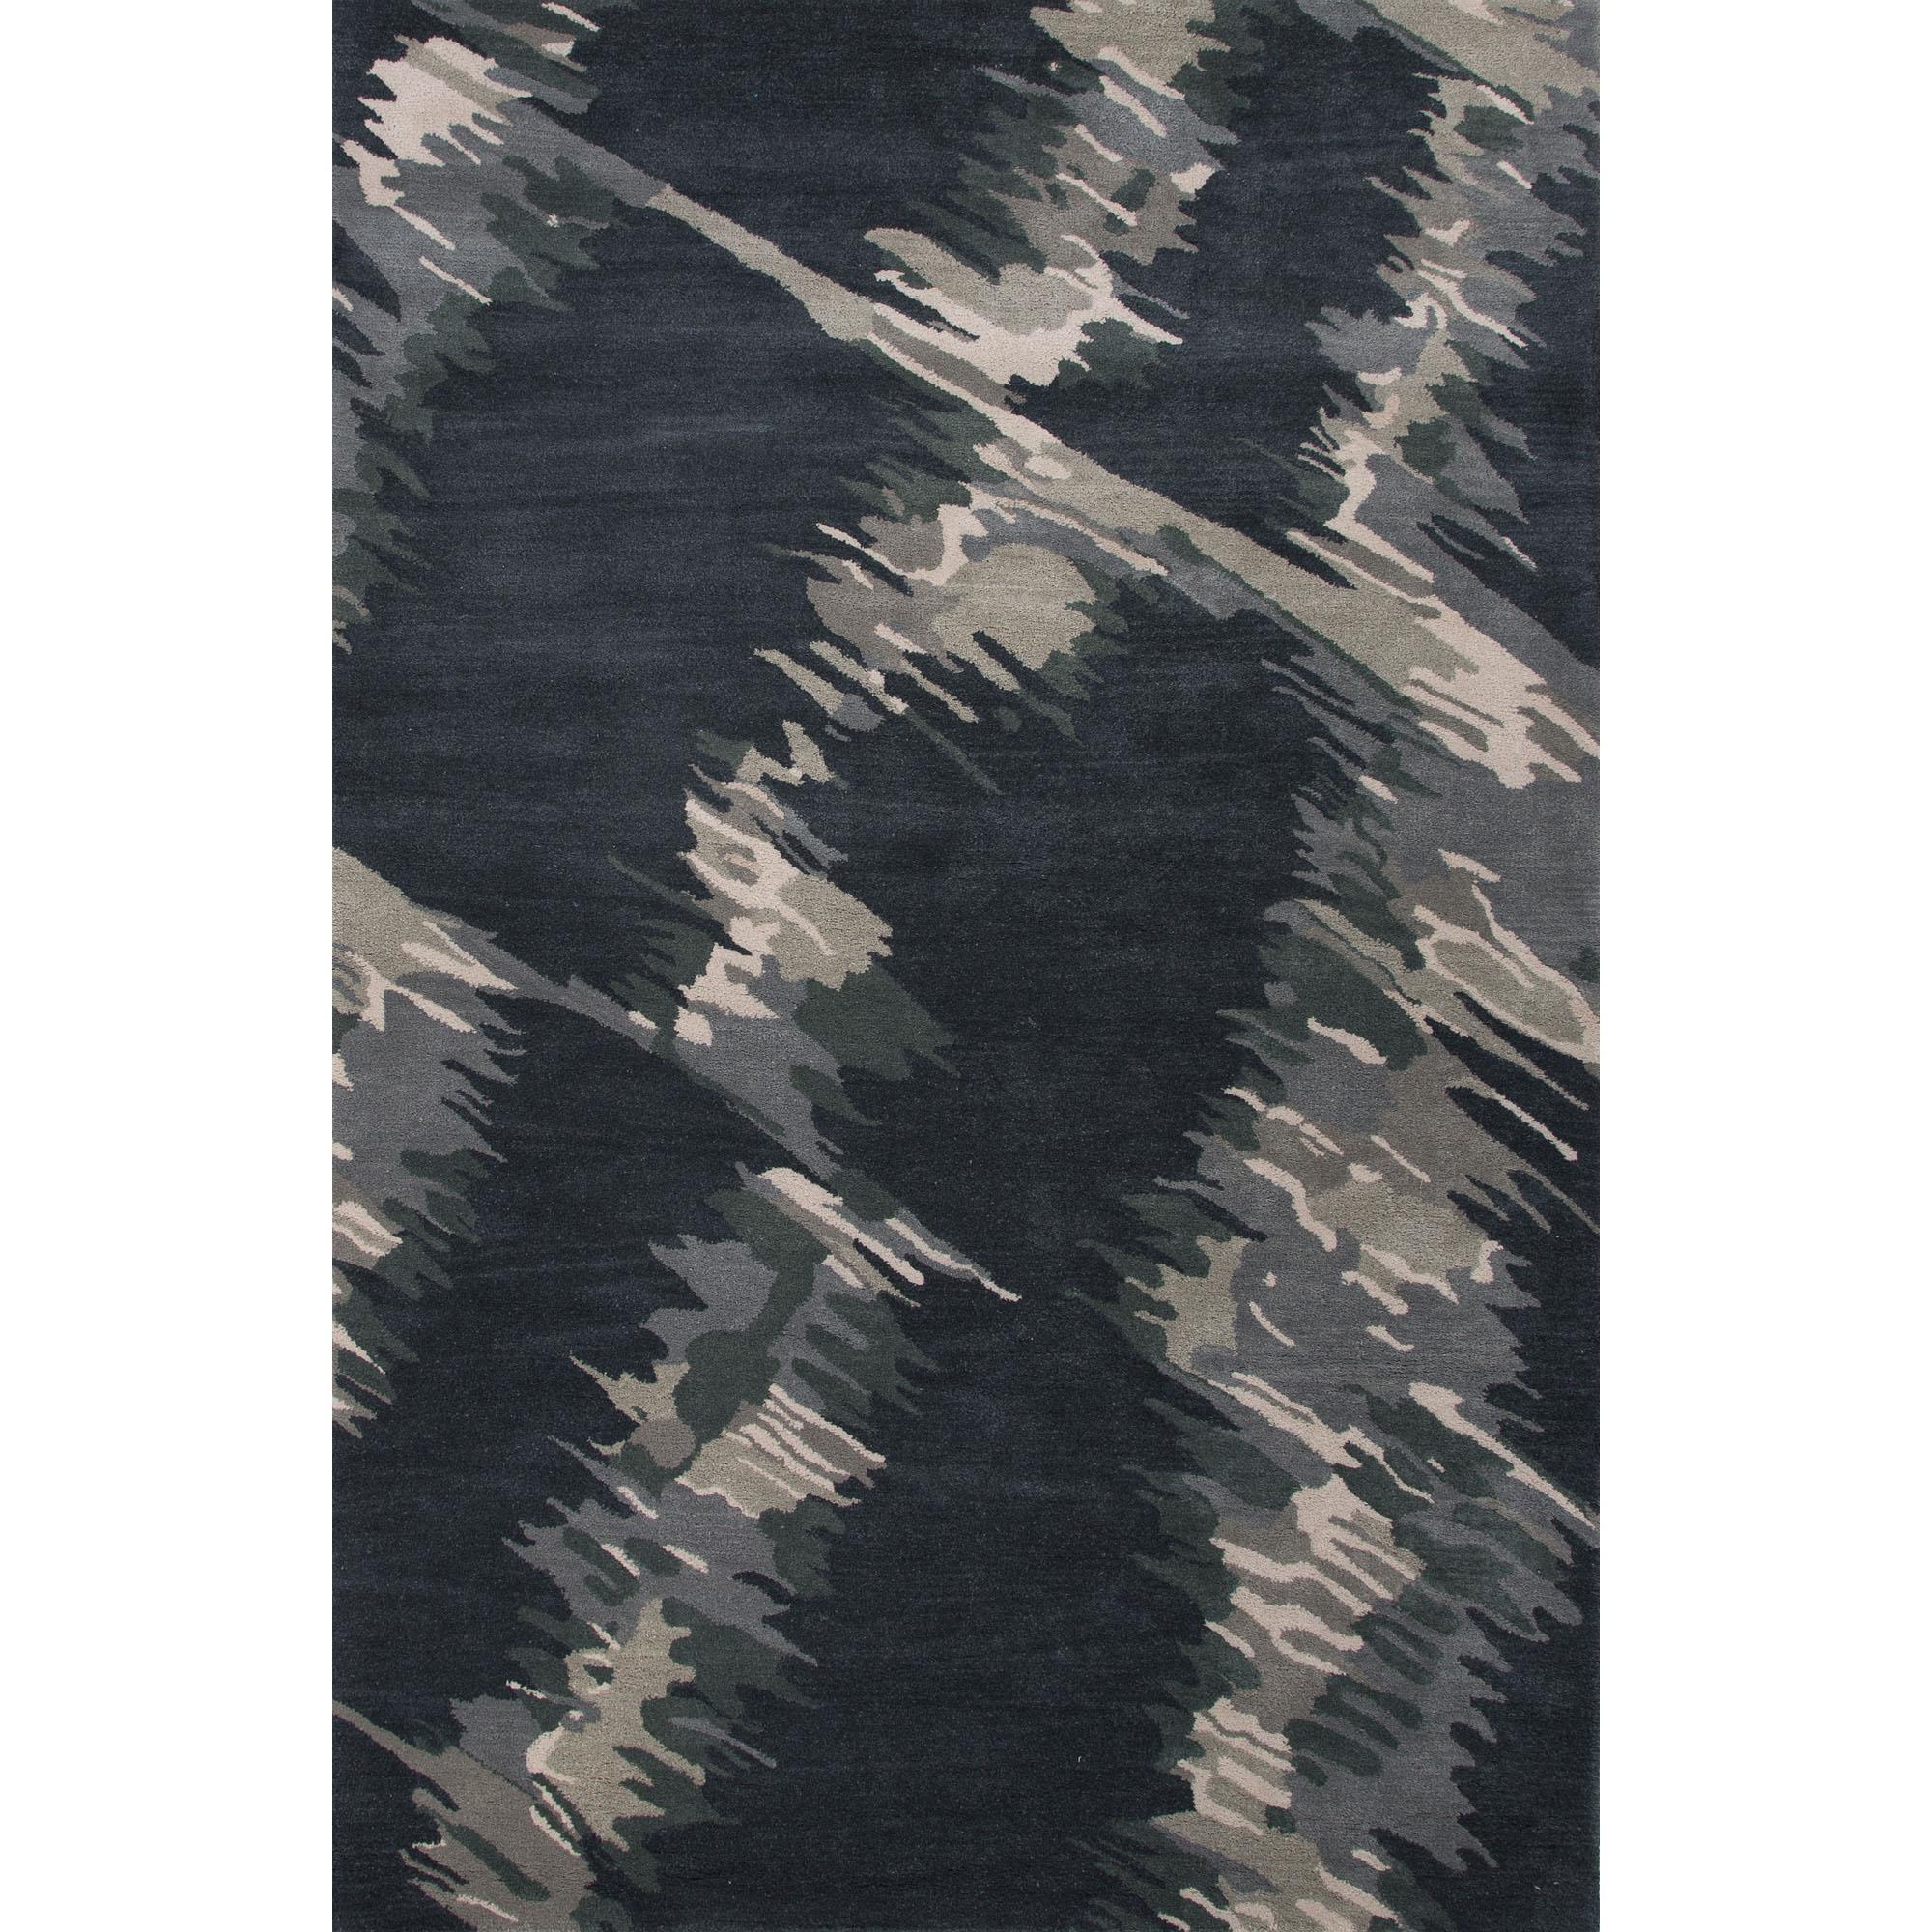 JAIPUR Rugs En Casa By Luli Sanchez Tufted 2 x 3 Rug - Item Number: RUG116772